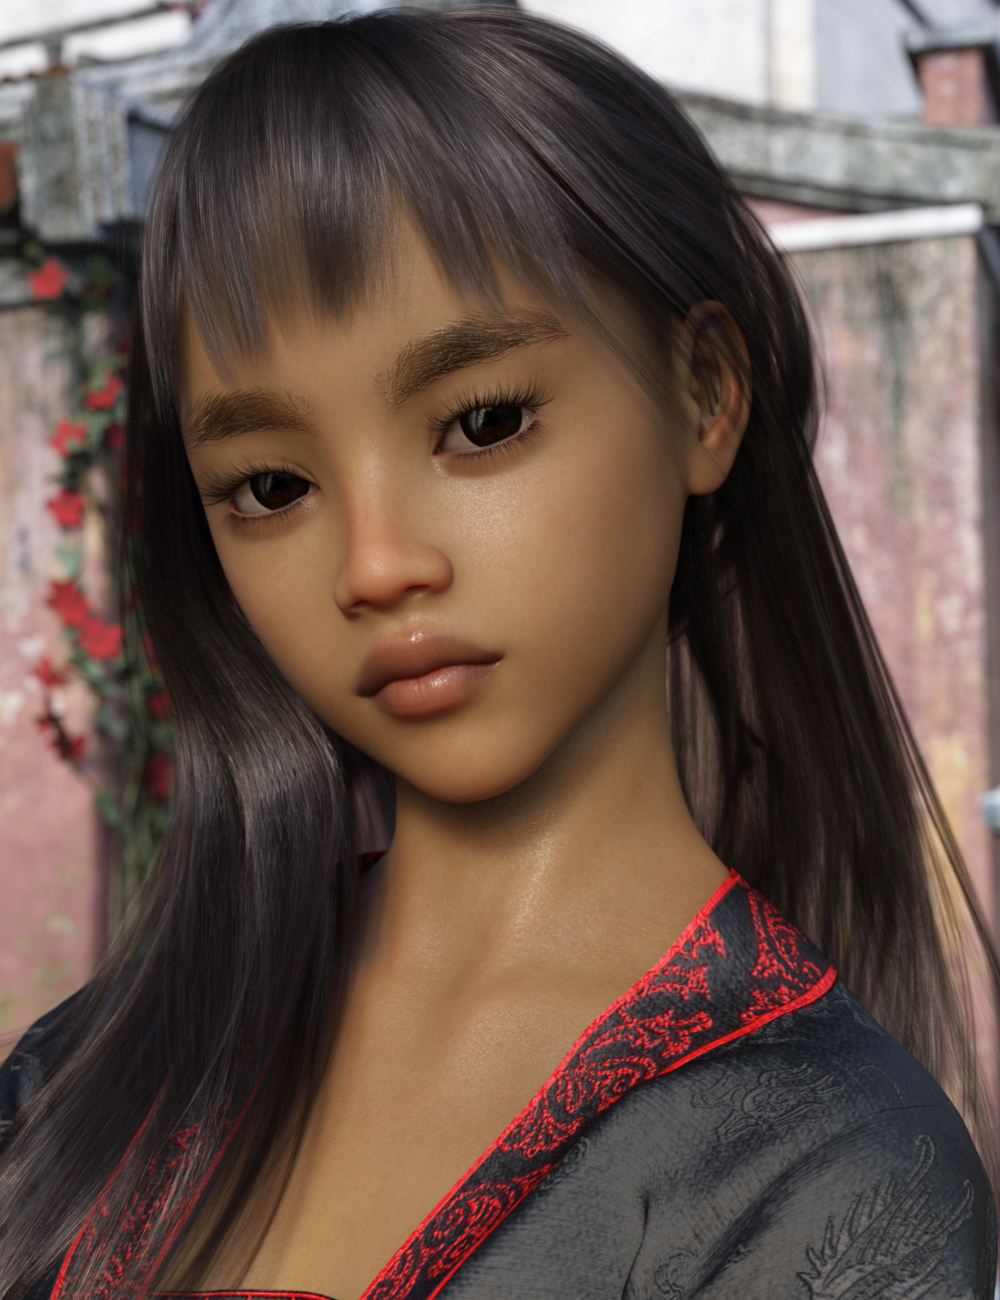 Anakku for Genesis 8 Female by: Thorne, 3D Models by Daz 3D